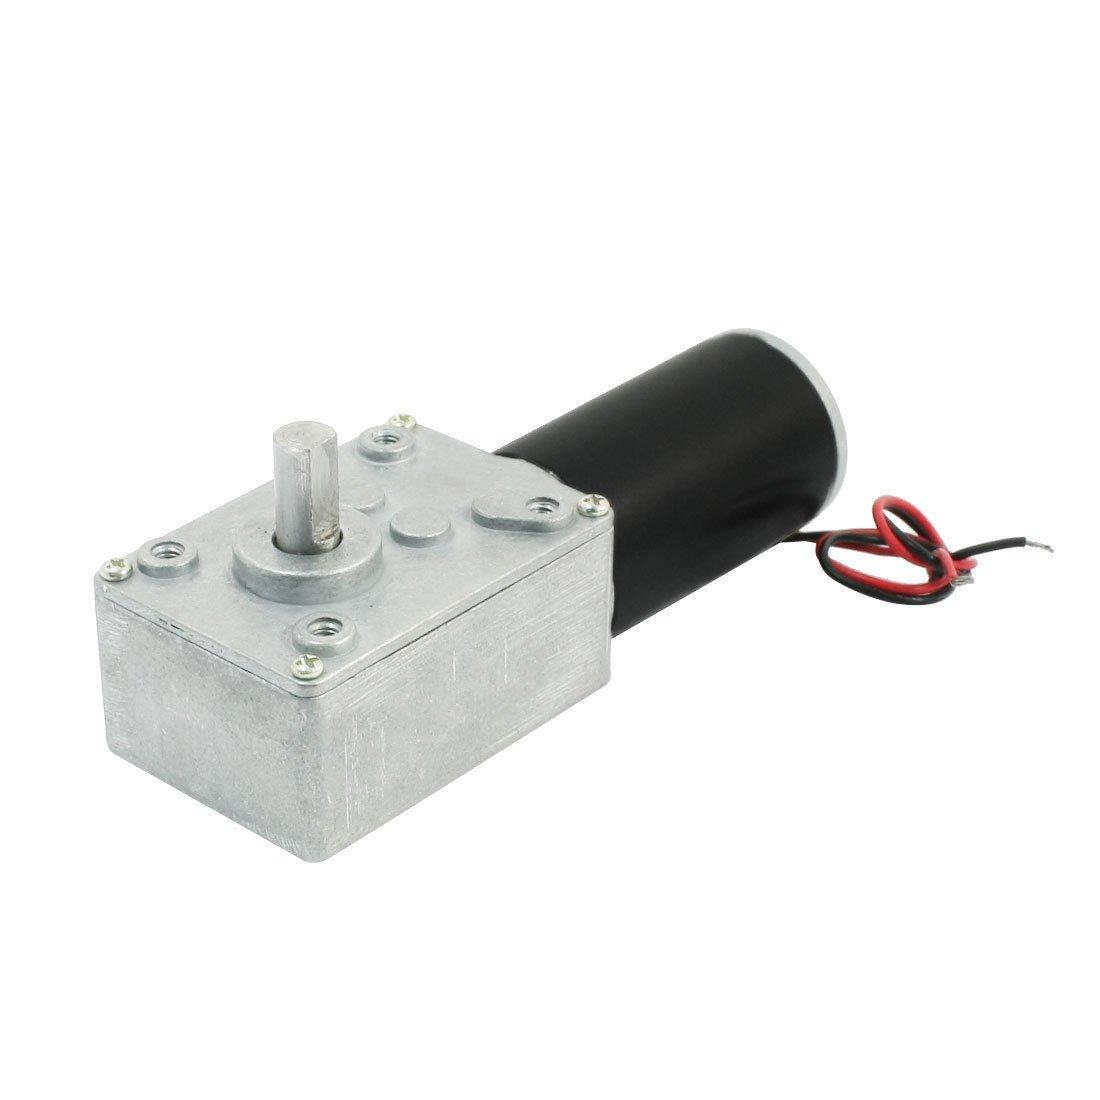 DC 24V 80RPM Rotary Speed Reduce High Torque Worm Gear Motor